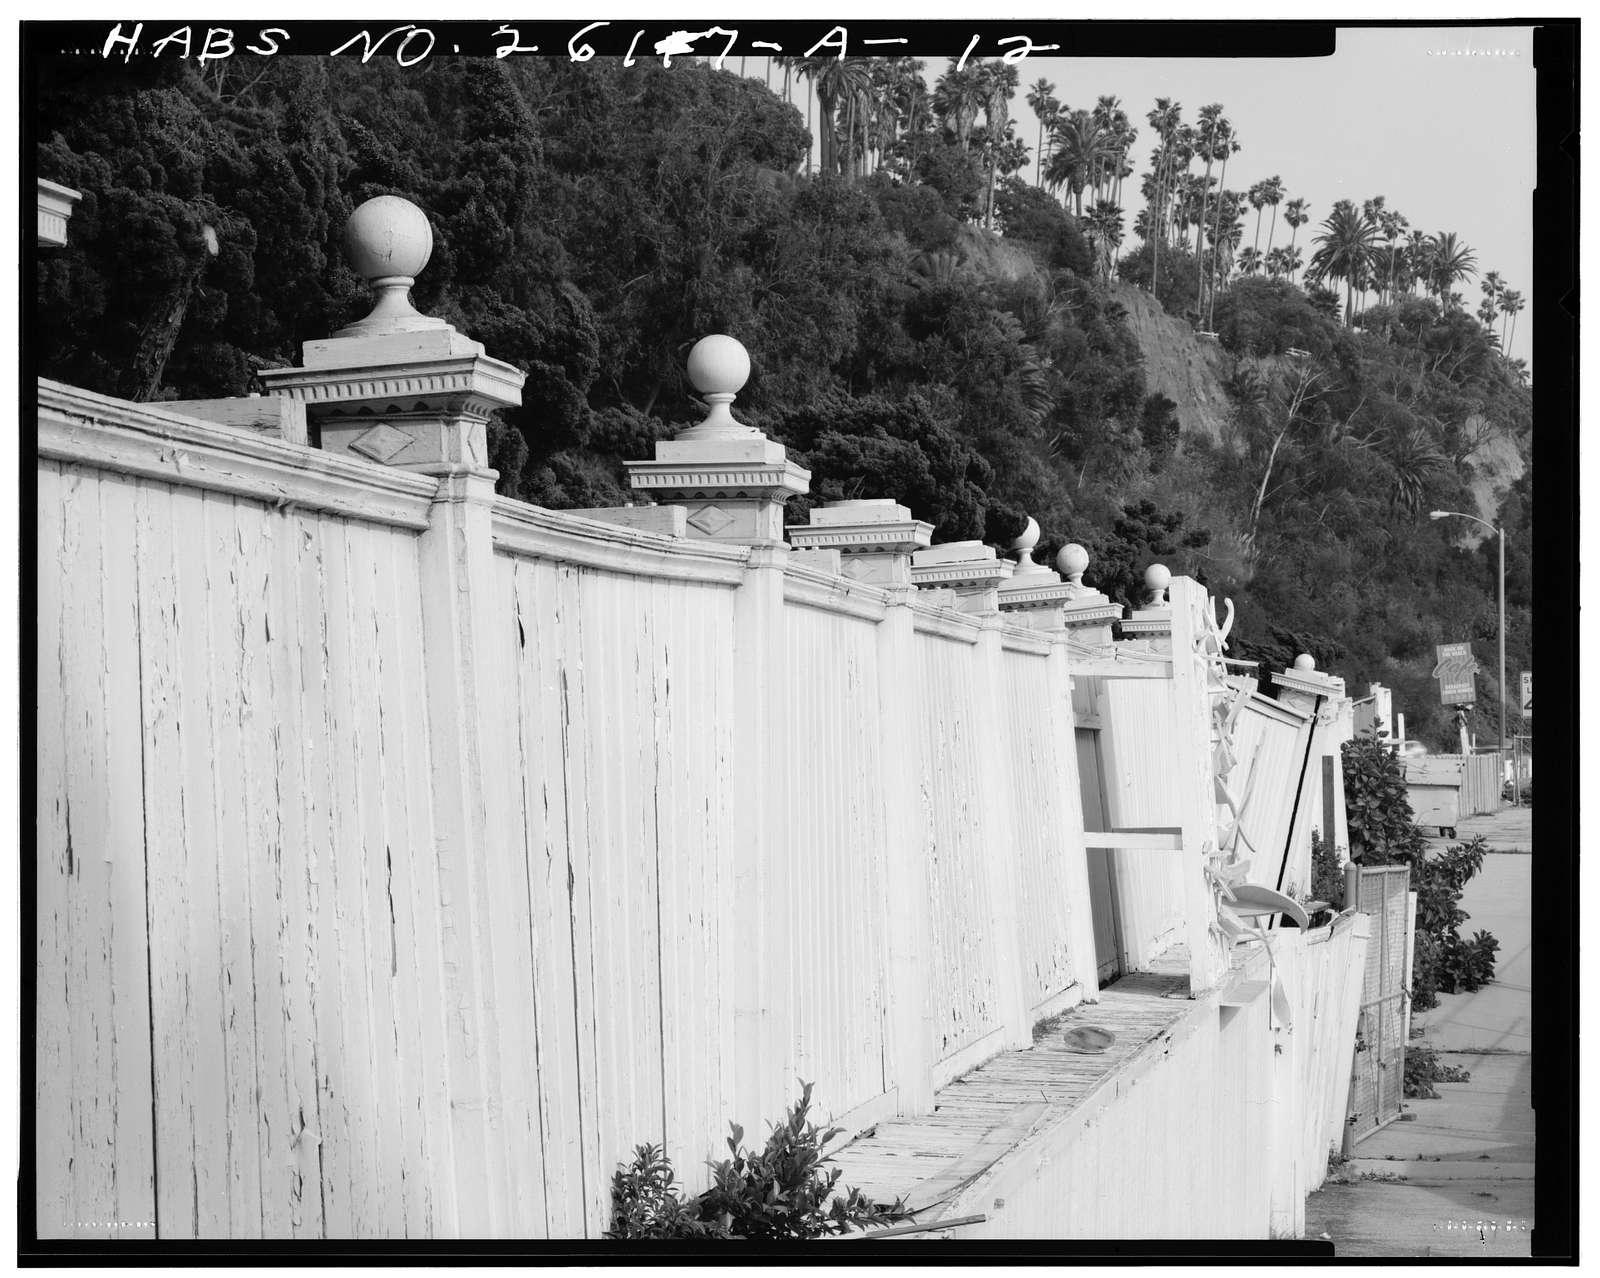 Marion Davies Estate, Fence & Bulkhead, 415 Pacific Coast Highway, Santa Monica, Los Angeles County, CA